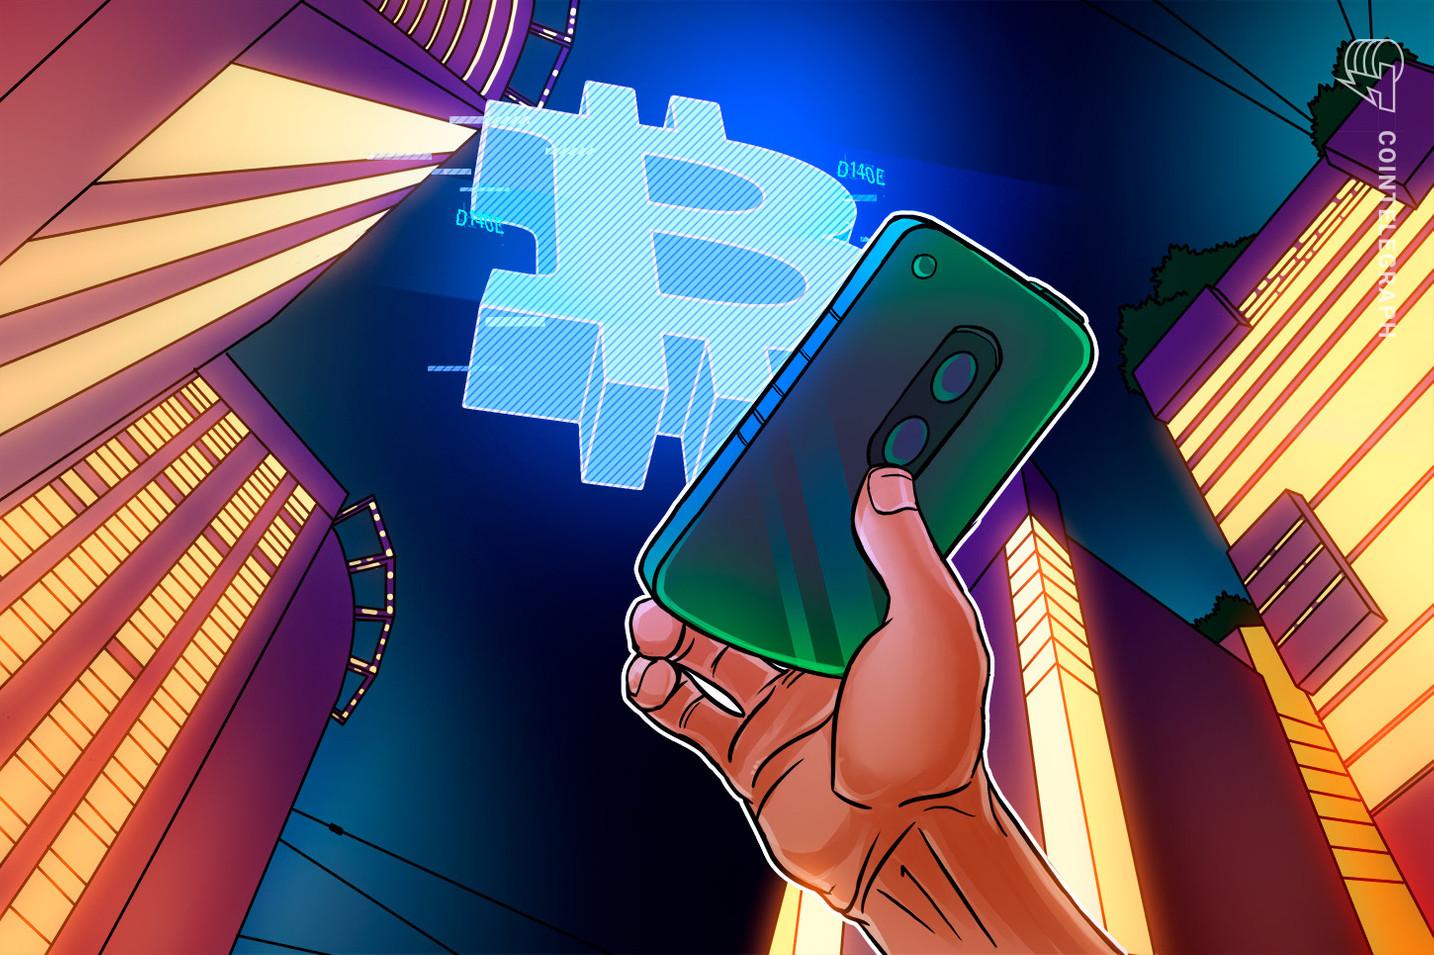 Bitcoin-Friendly Square Cash App Stock Price up 56% in 2019